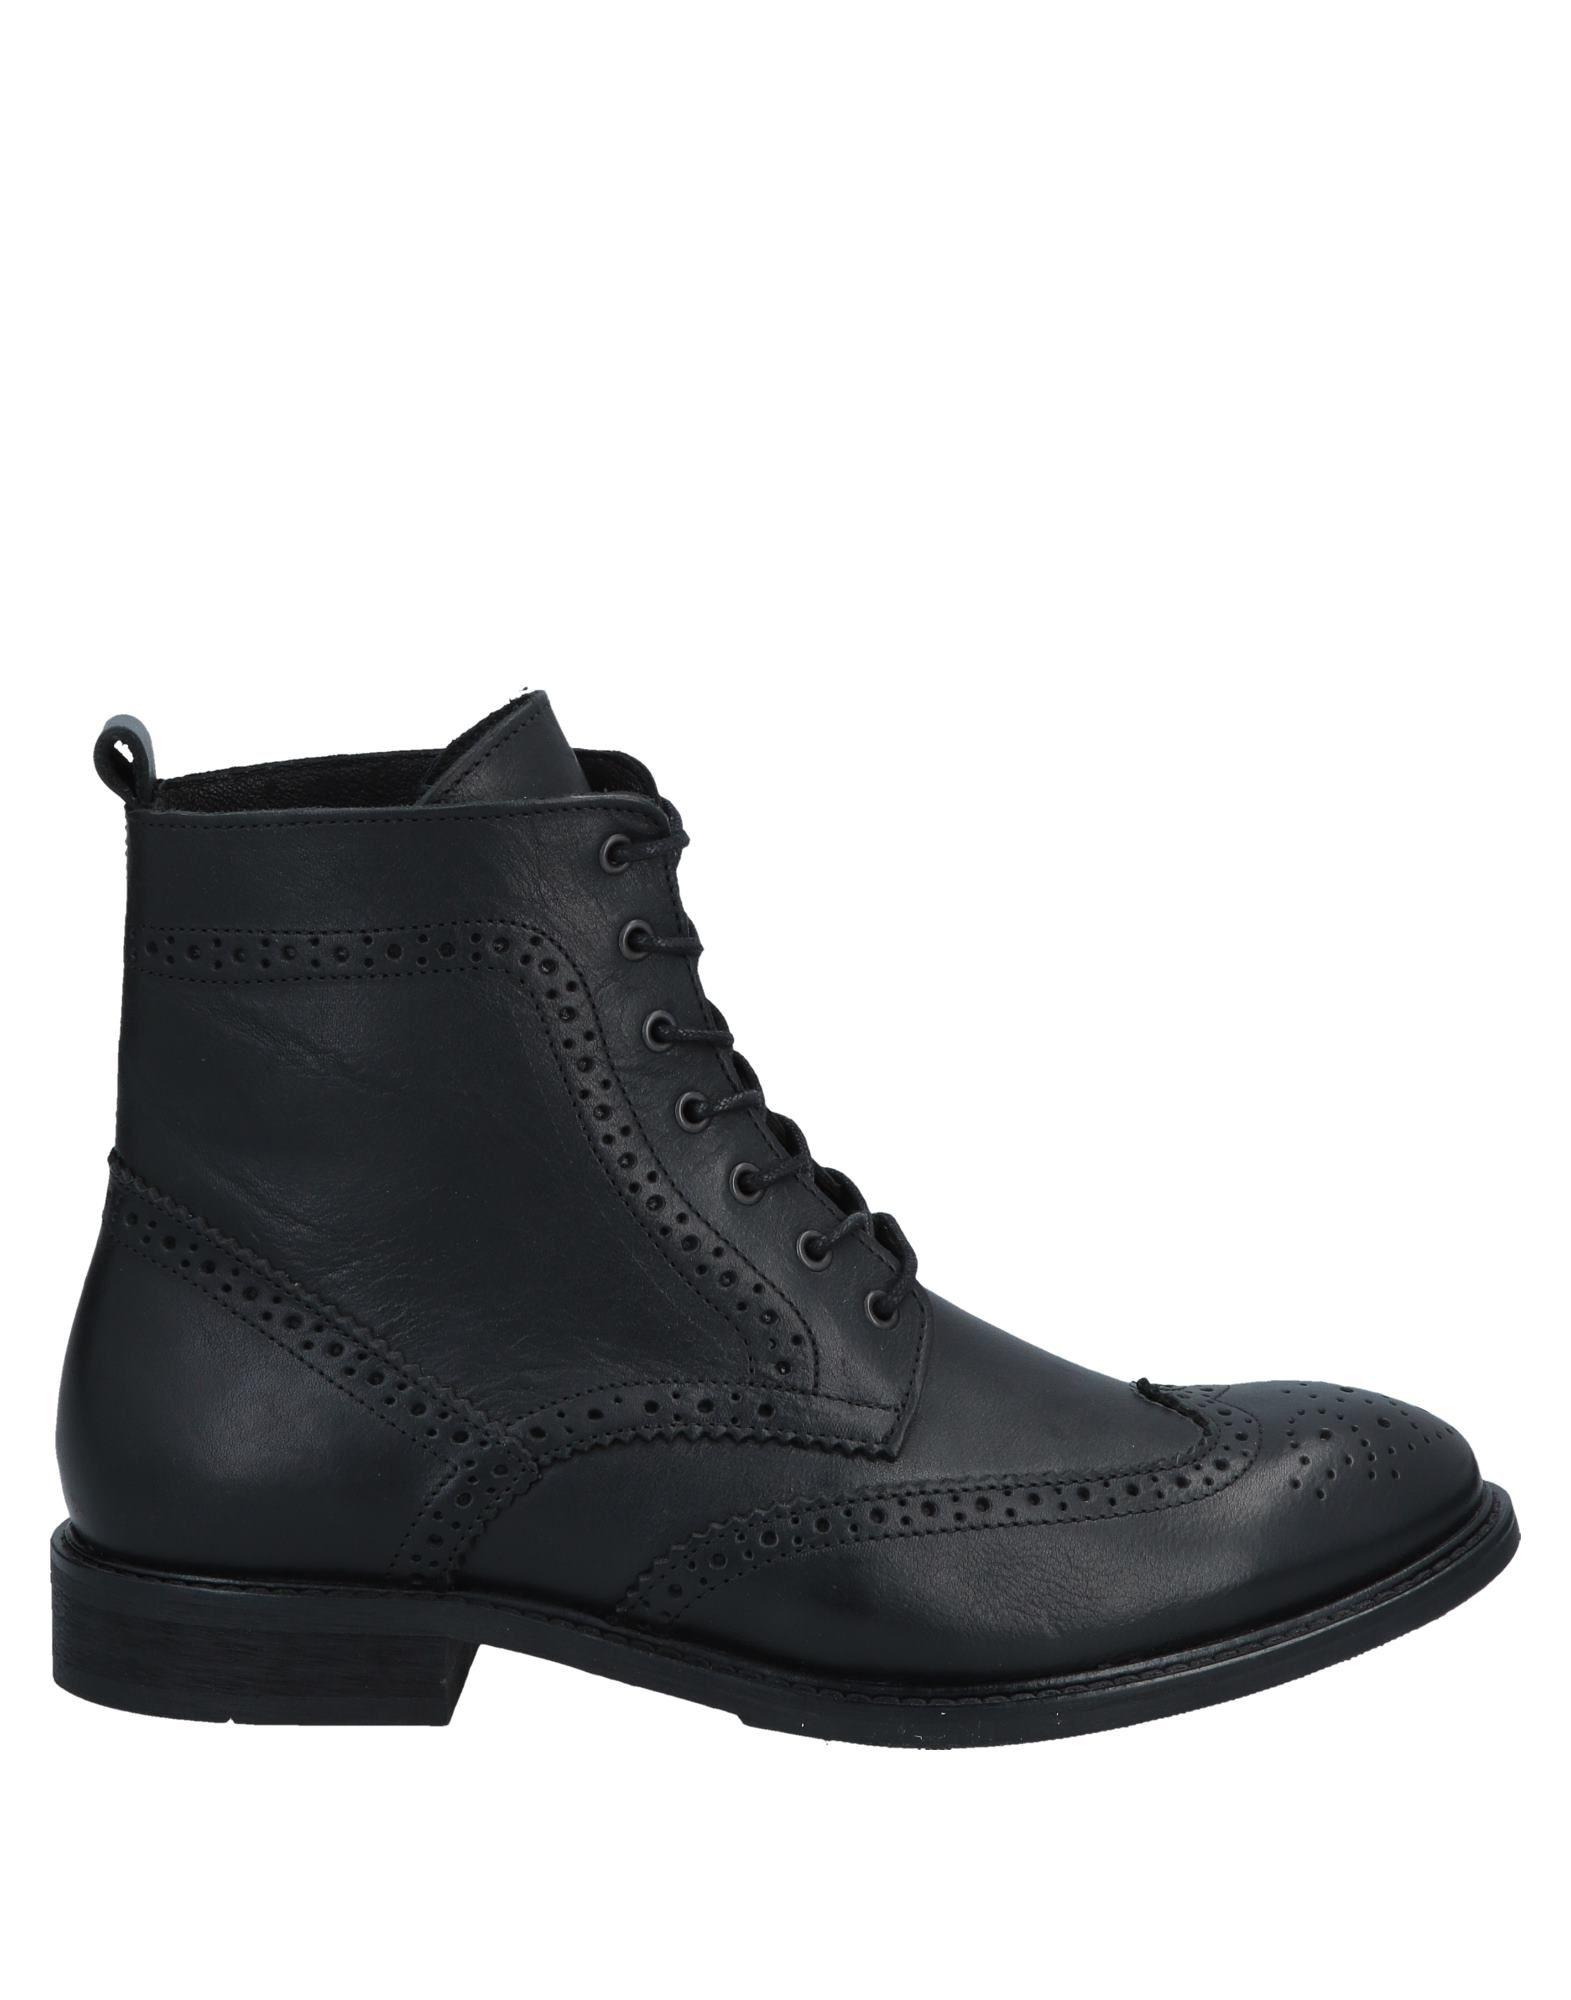 SHOE THE BEAR Полусапоги и высокие ботинки ботинки высокие quiksilver jax m shoe black brown